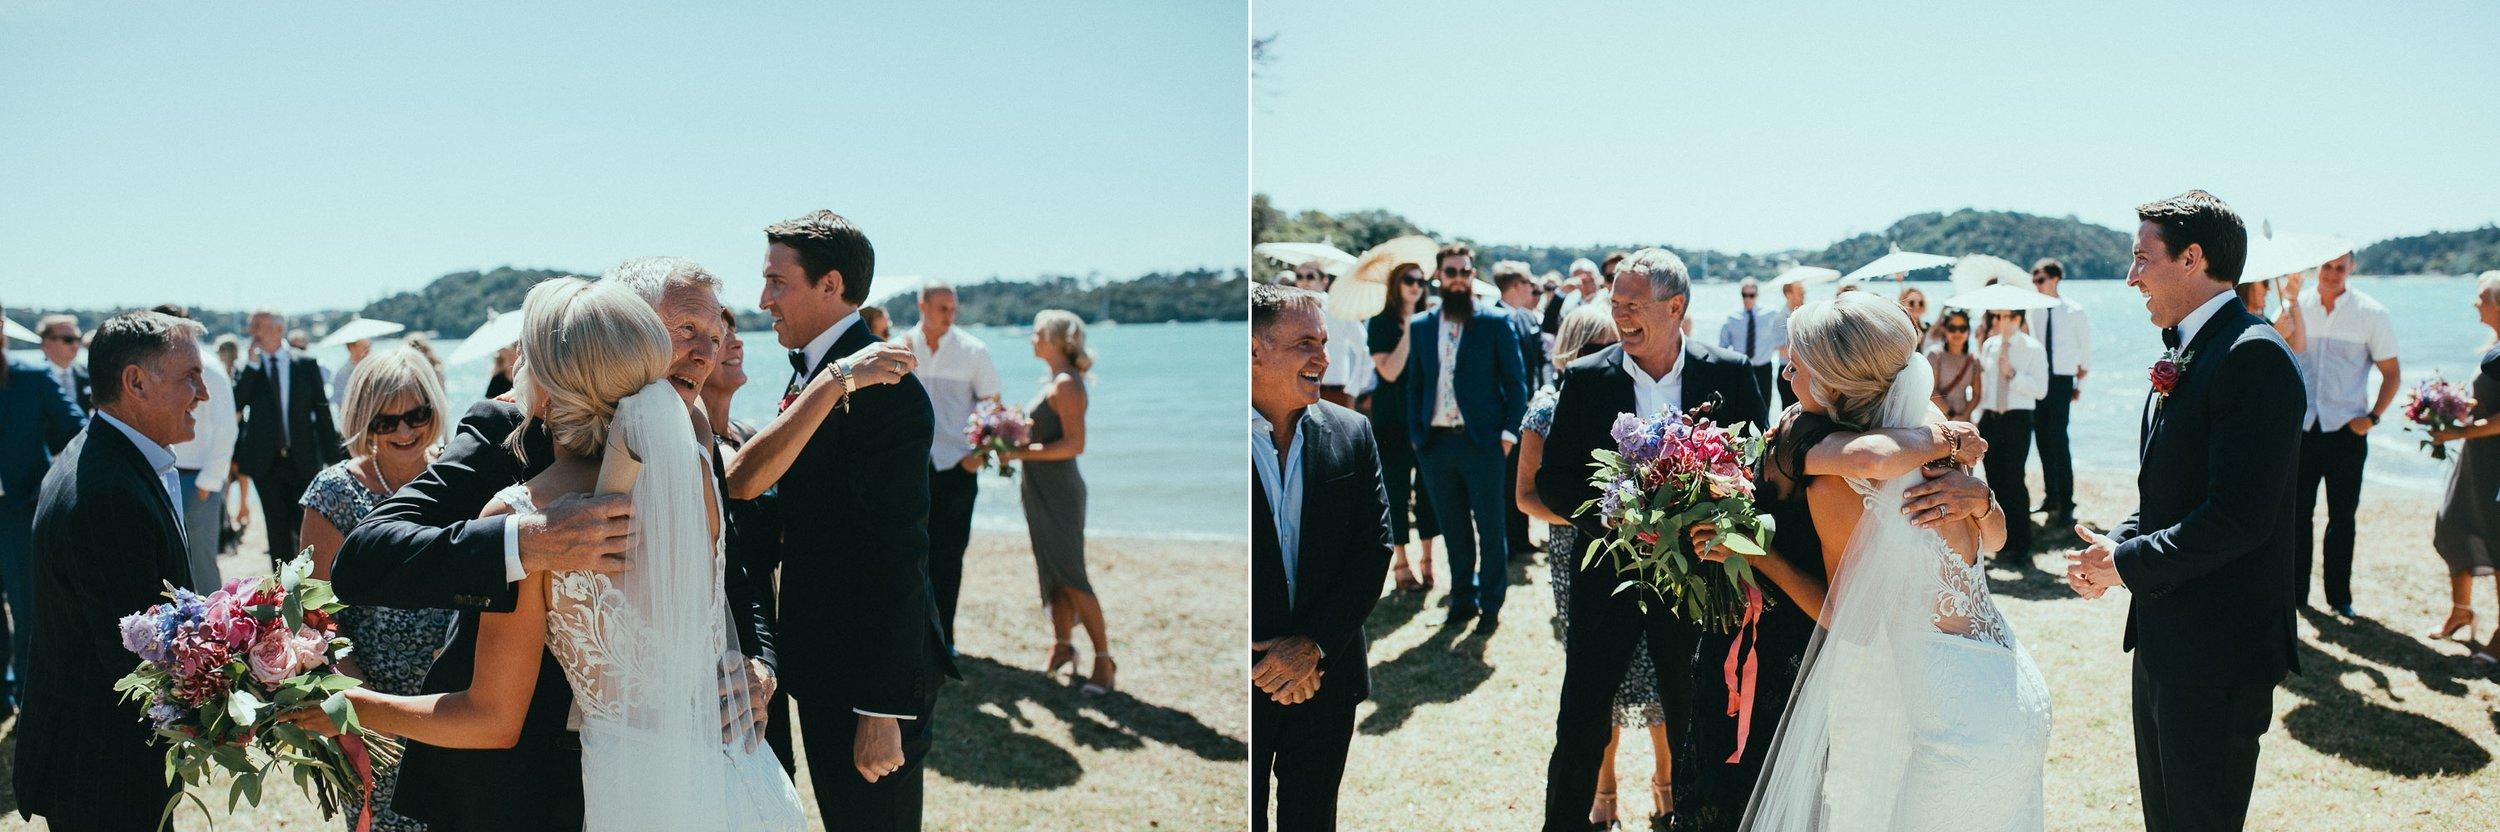 new-zealand-wedding-auckland (59).jpg